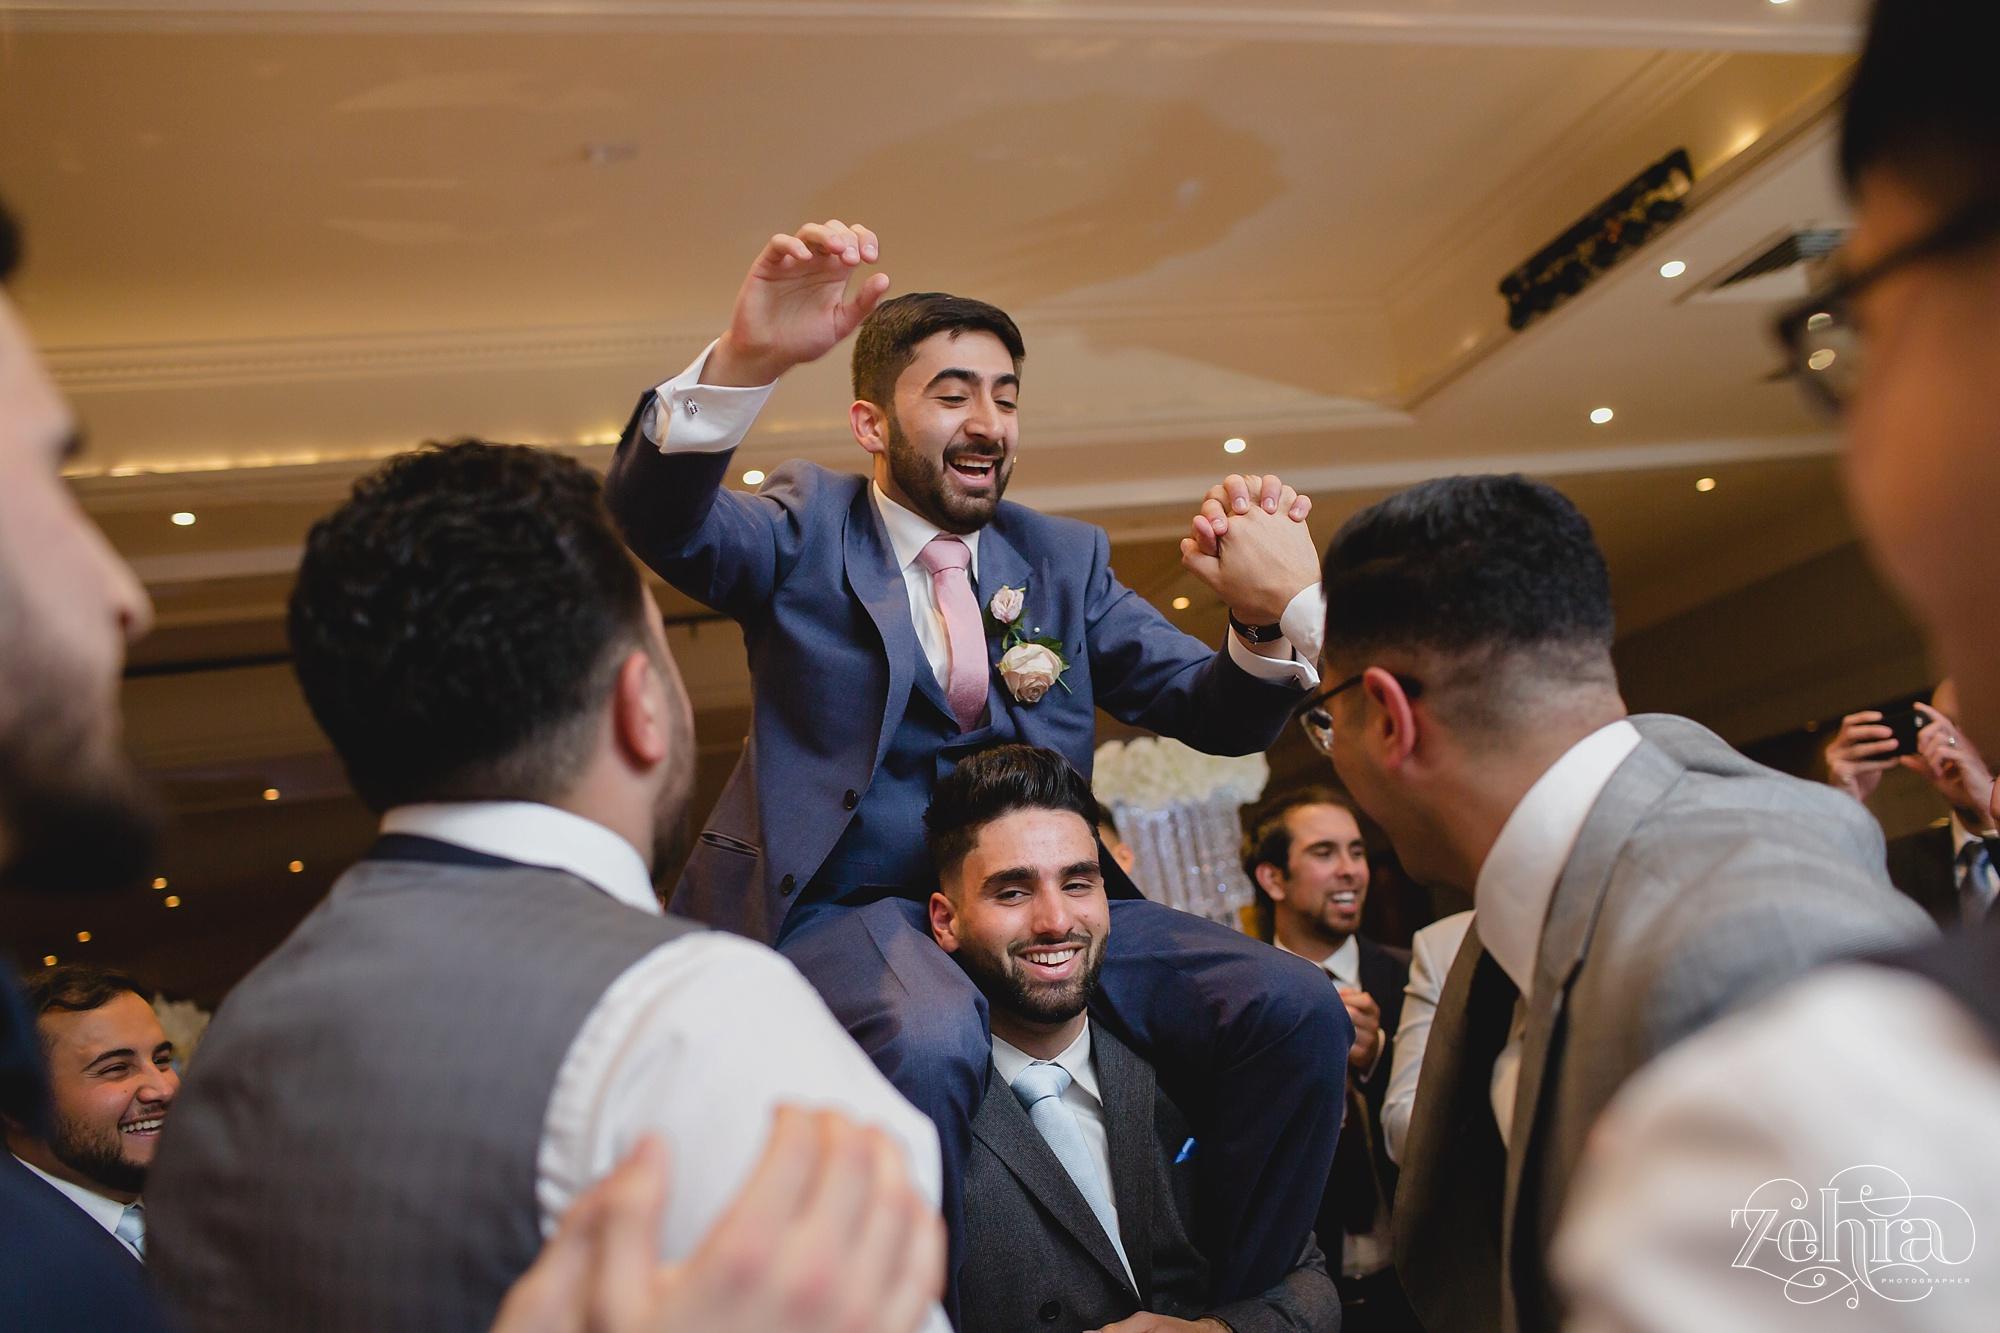 zehra photographer mere cheshire wedding_0036.jpg